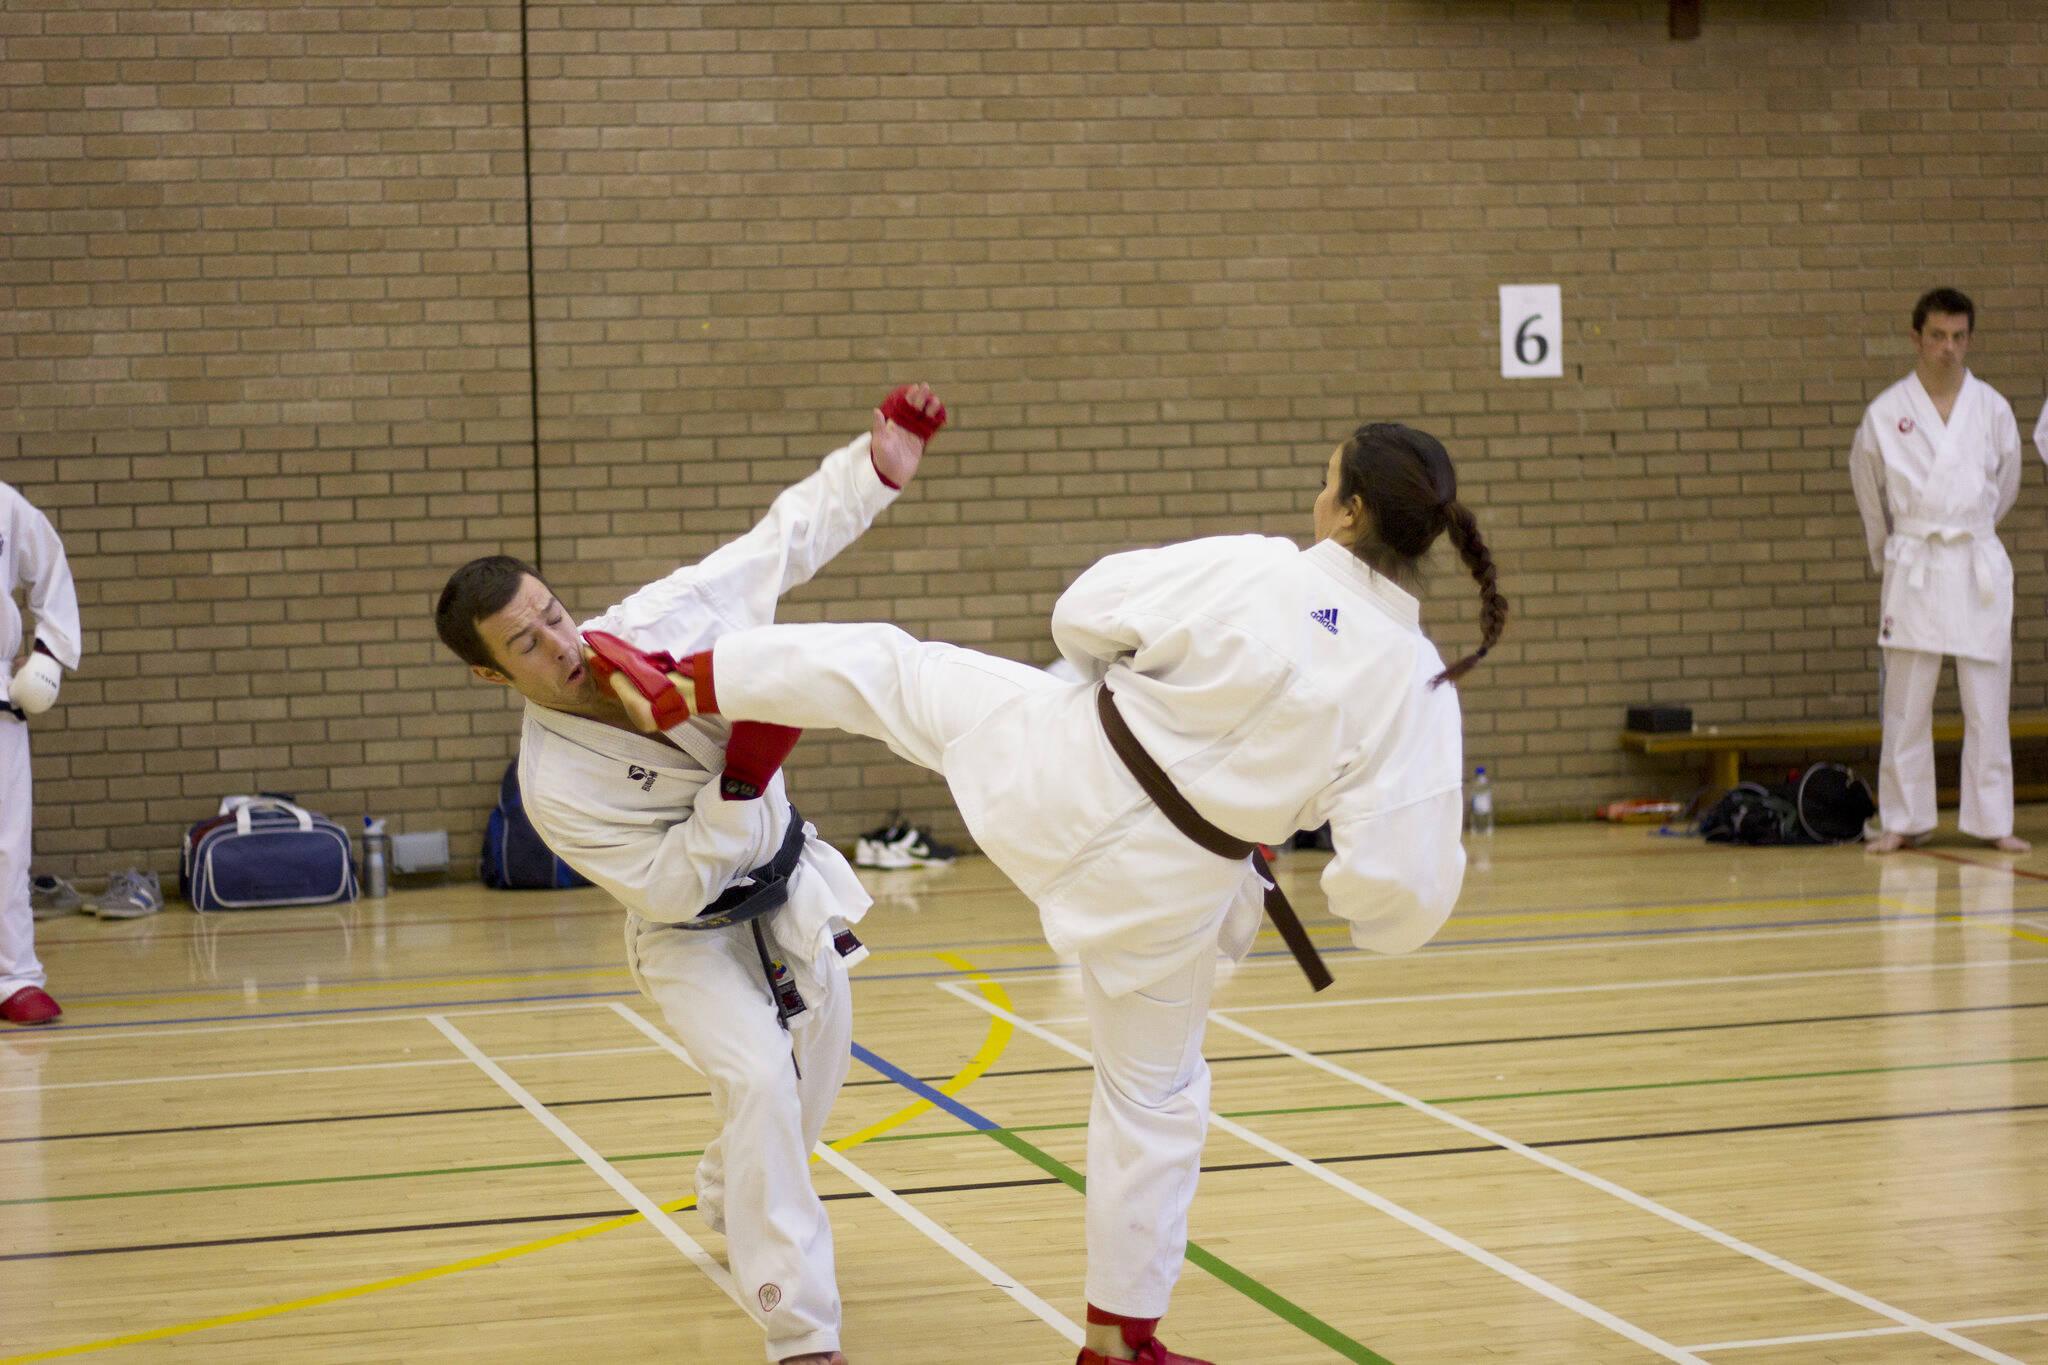 karate toronto